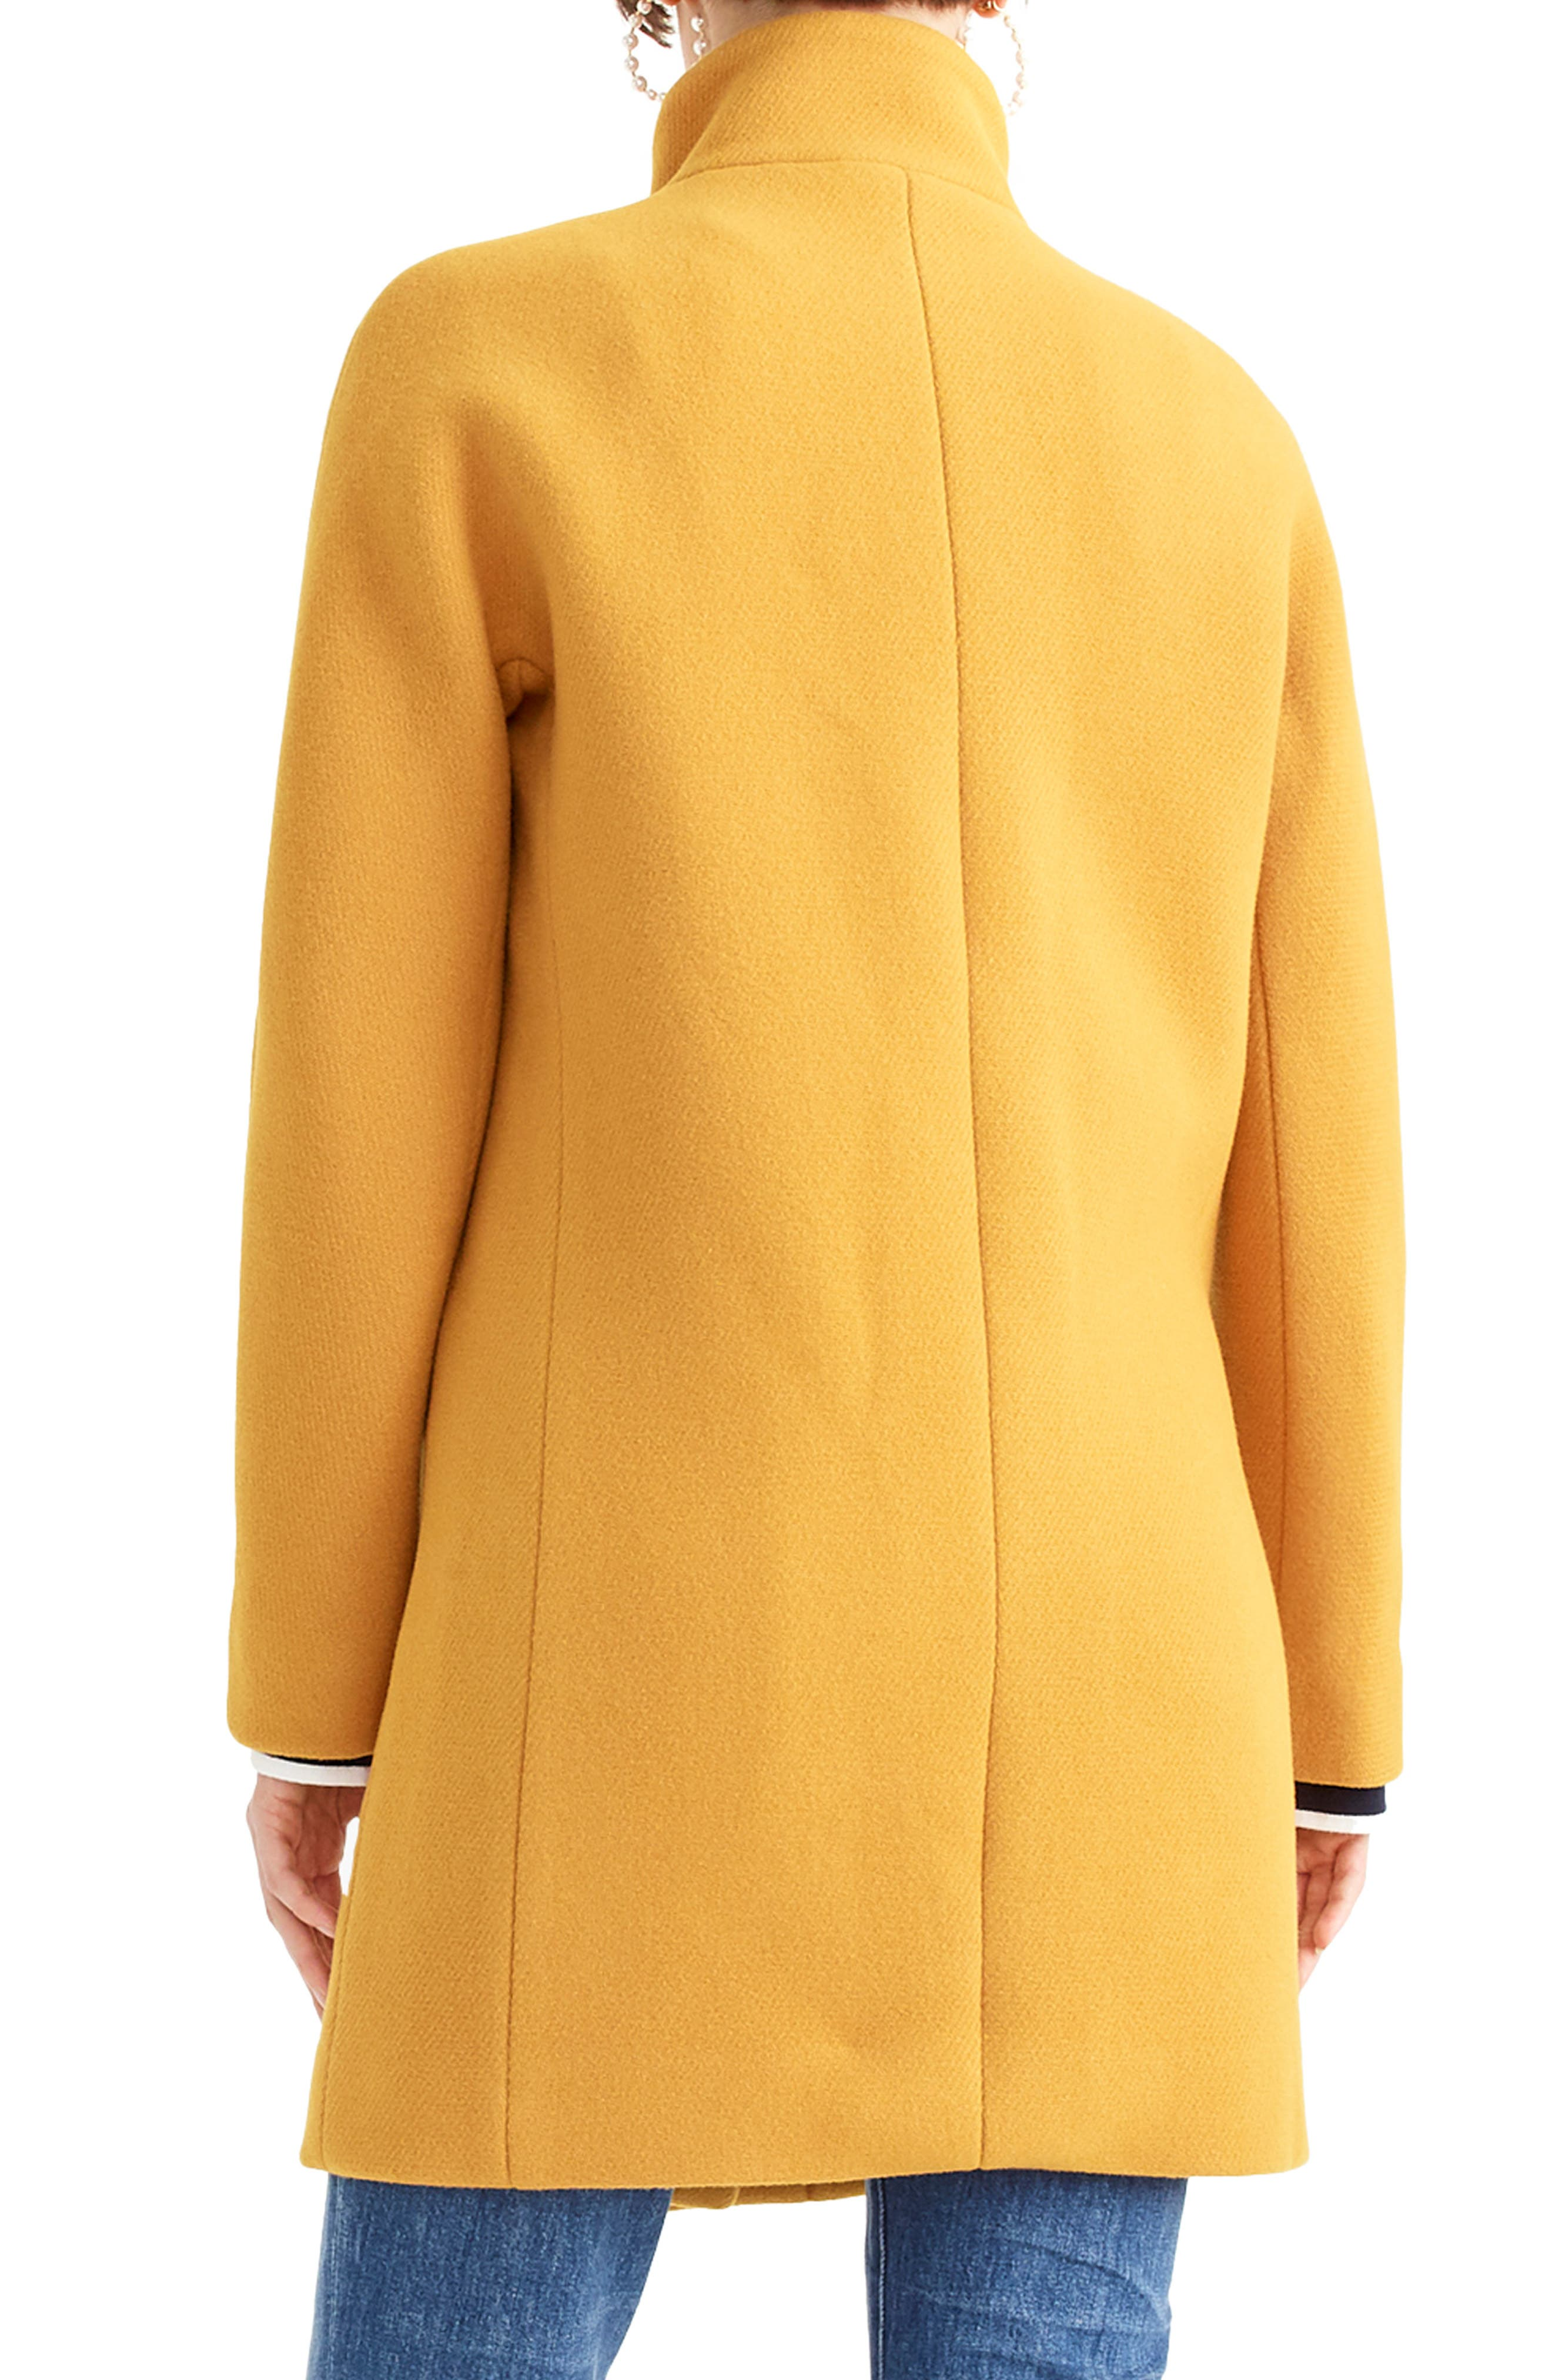 J.CREW, Stadium Cloth Cocoon Coat, Alternate thumbnail 2, color, 800